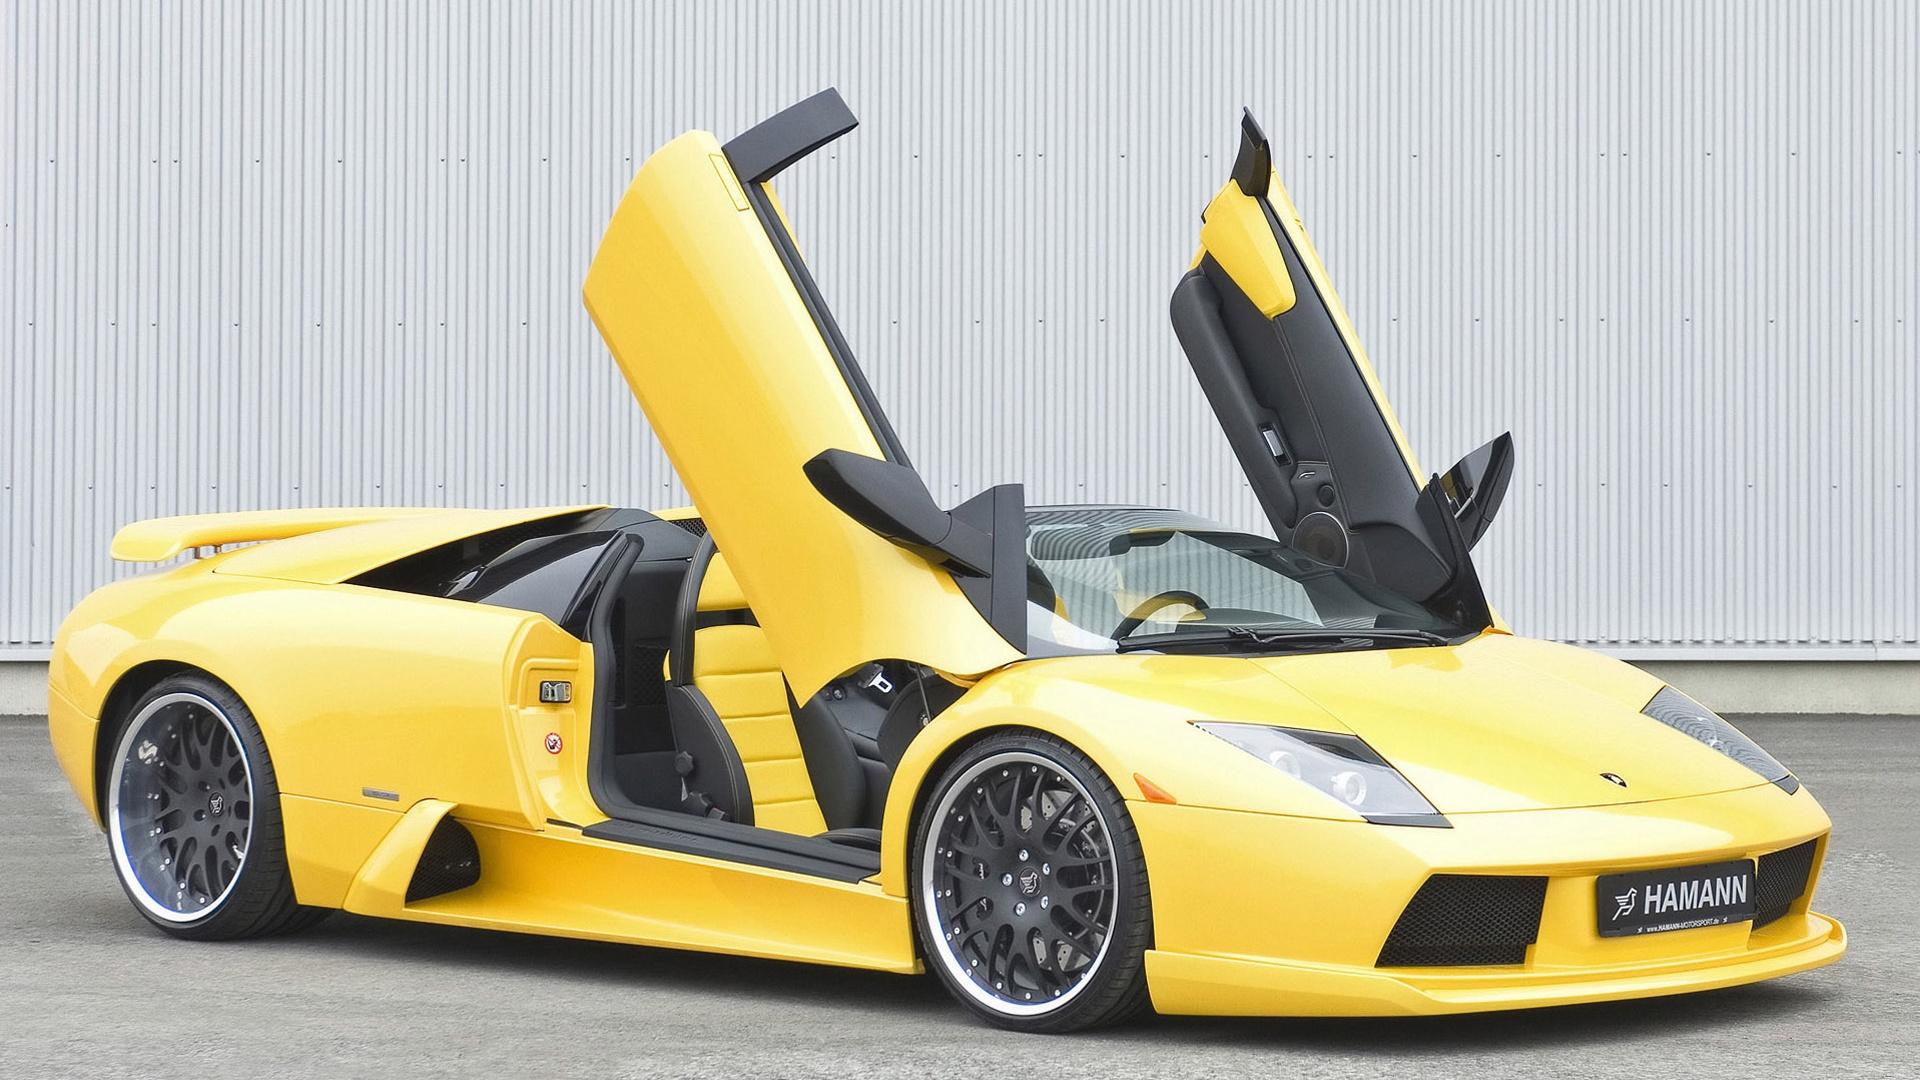 Yellow Lamborghini wallpaper 1920x1080.